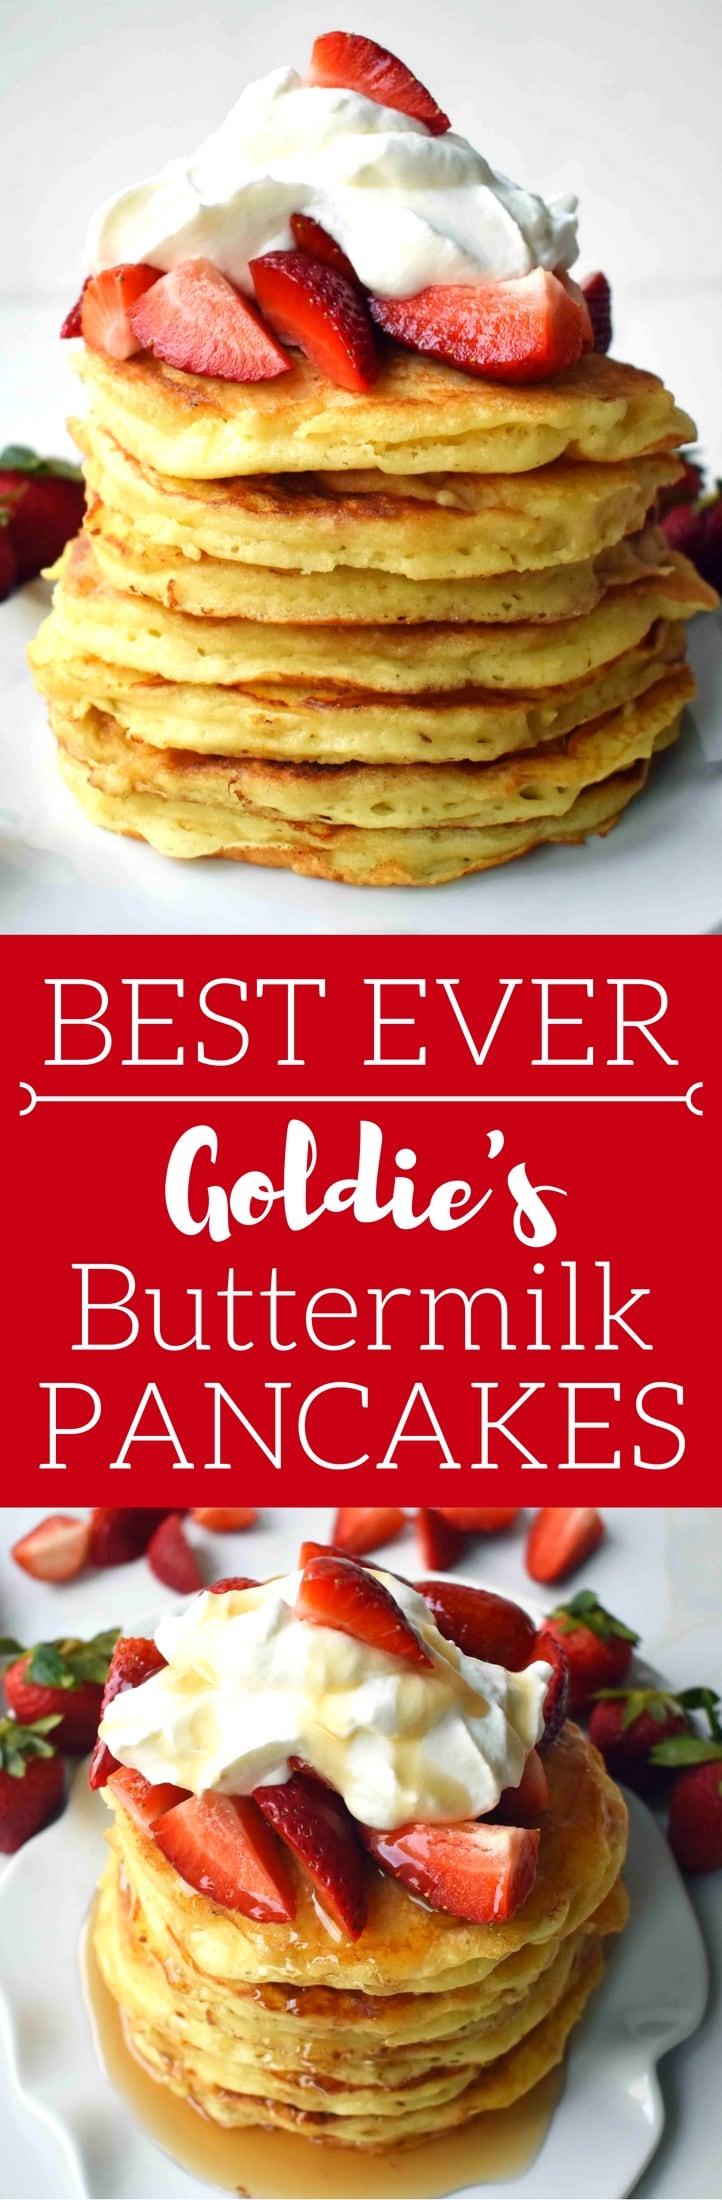 Goldie's Best Buttermilk Pancakes. Tender, soft, fluffy and buttery buttermilk pancakes. www.modernhoney.com